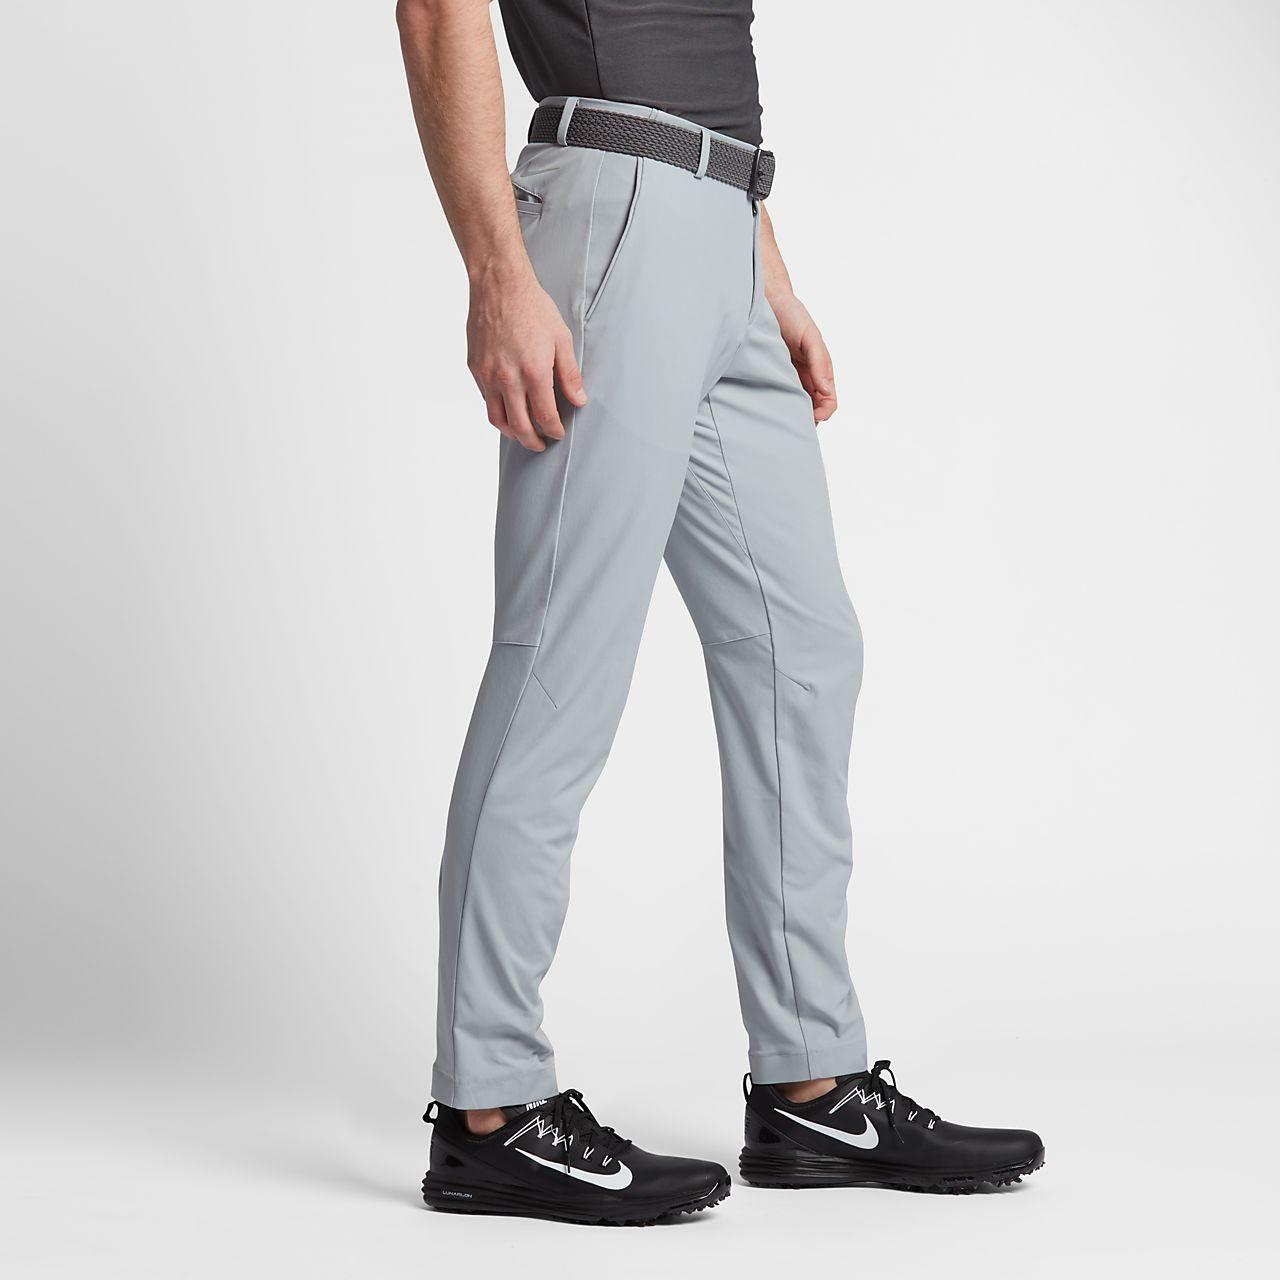 ... Nike Flex Men's Golf Trousers